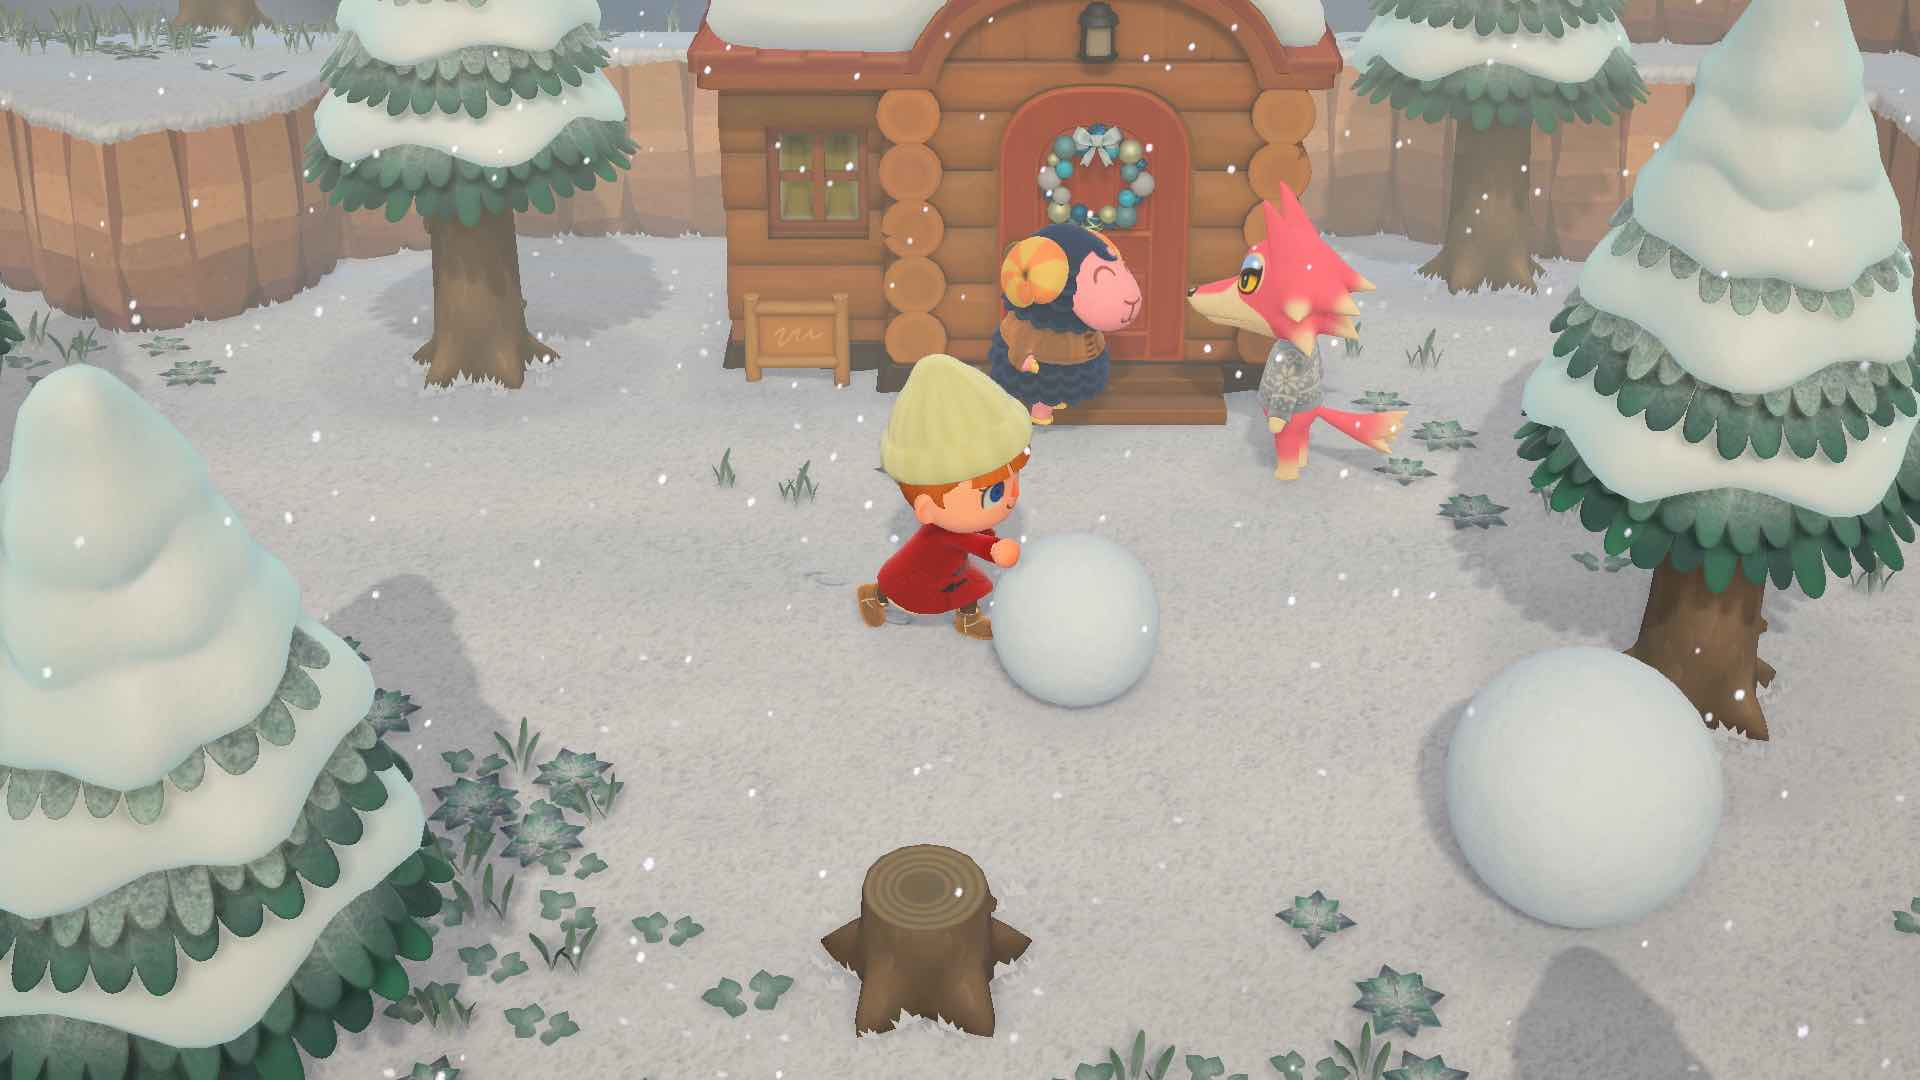 Animal-Crossing-New-Horizons-2